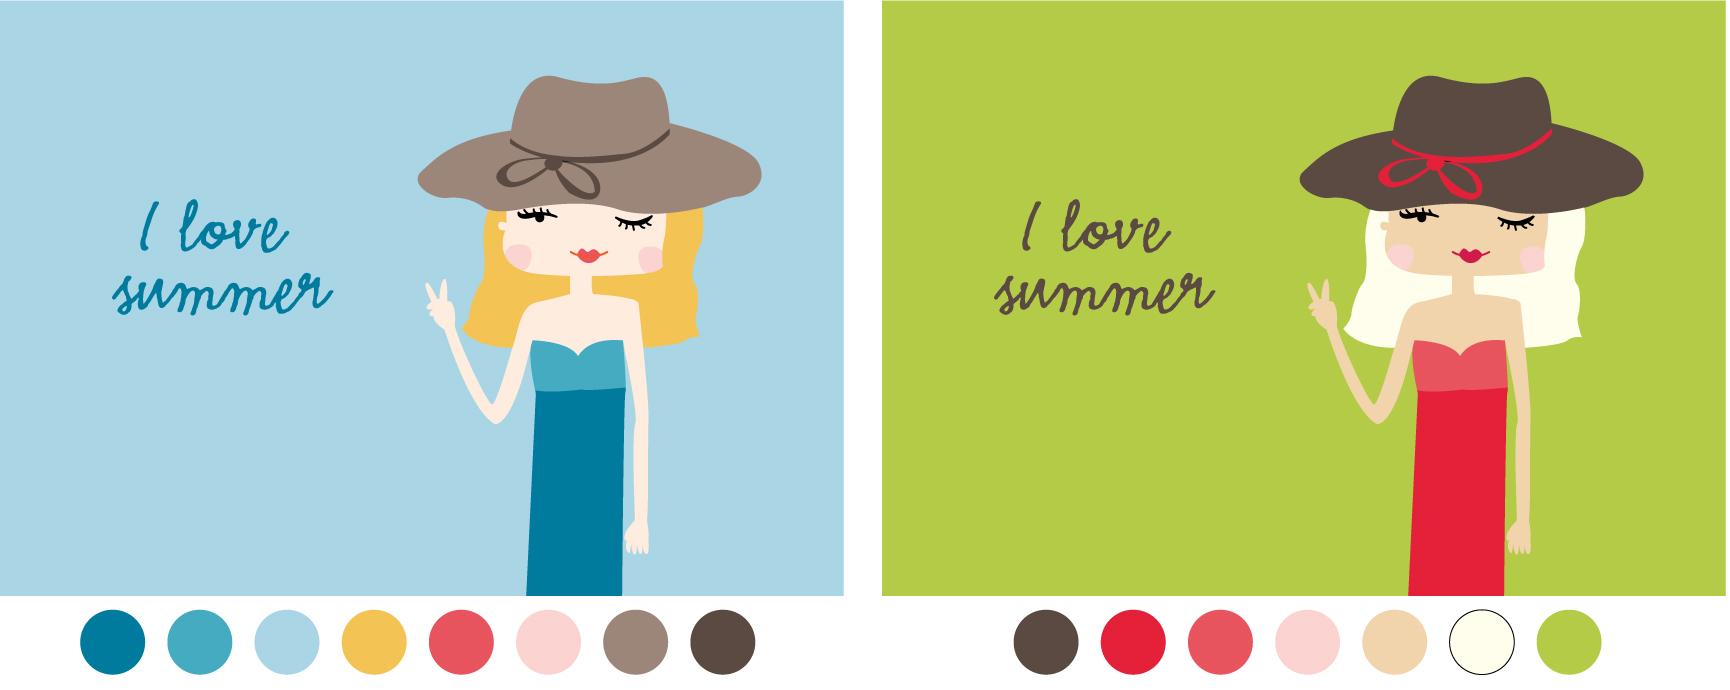 Summer Girl: Colour Variations | thecarolinejohansson.com